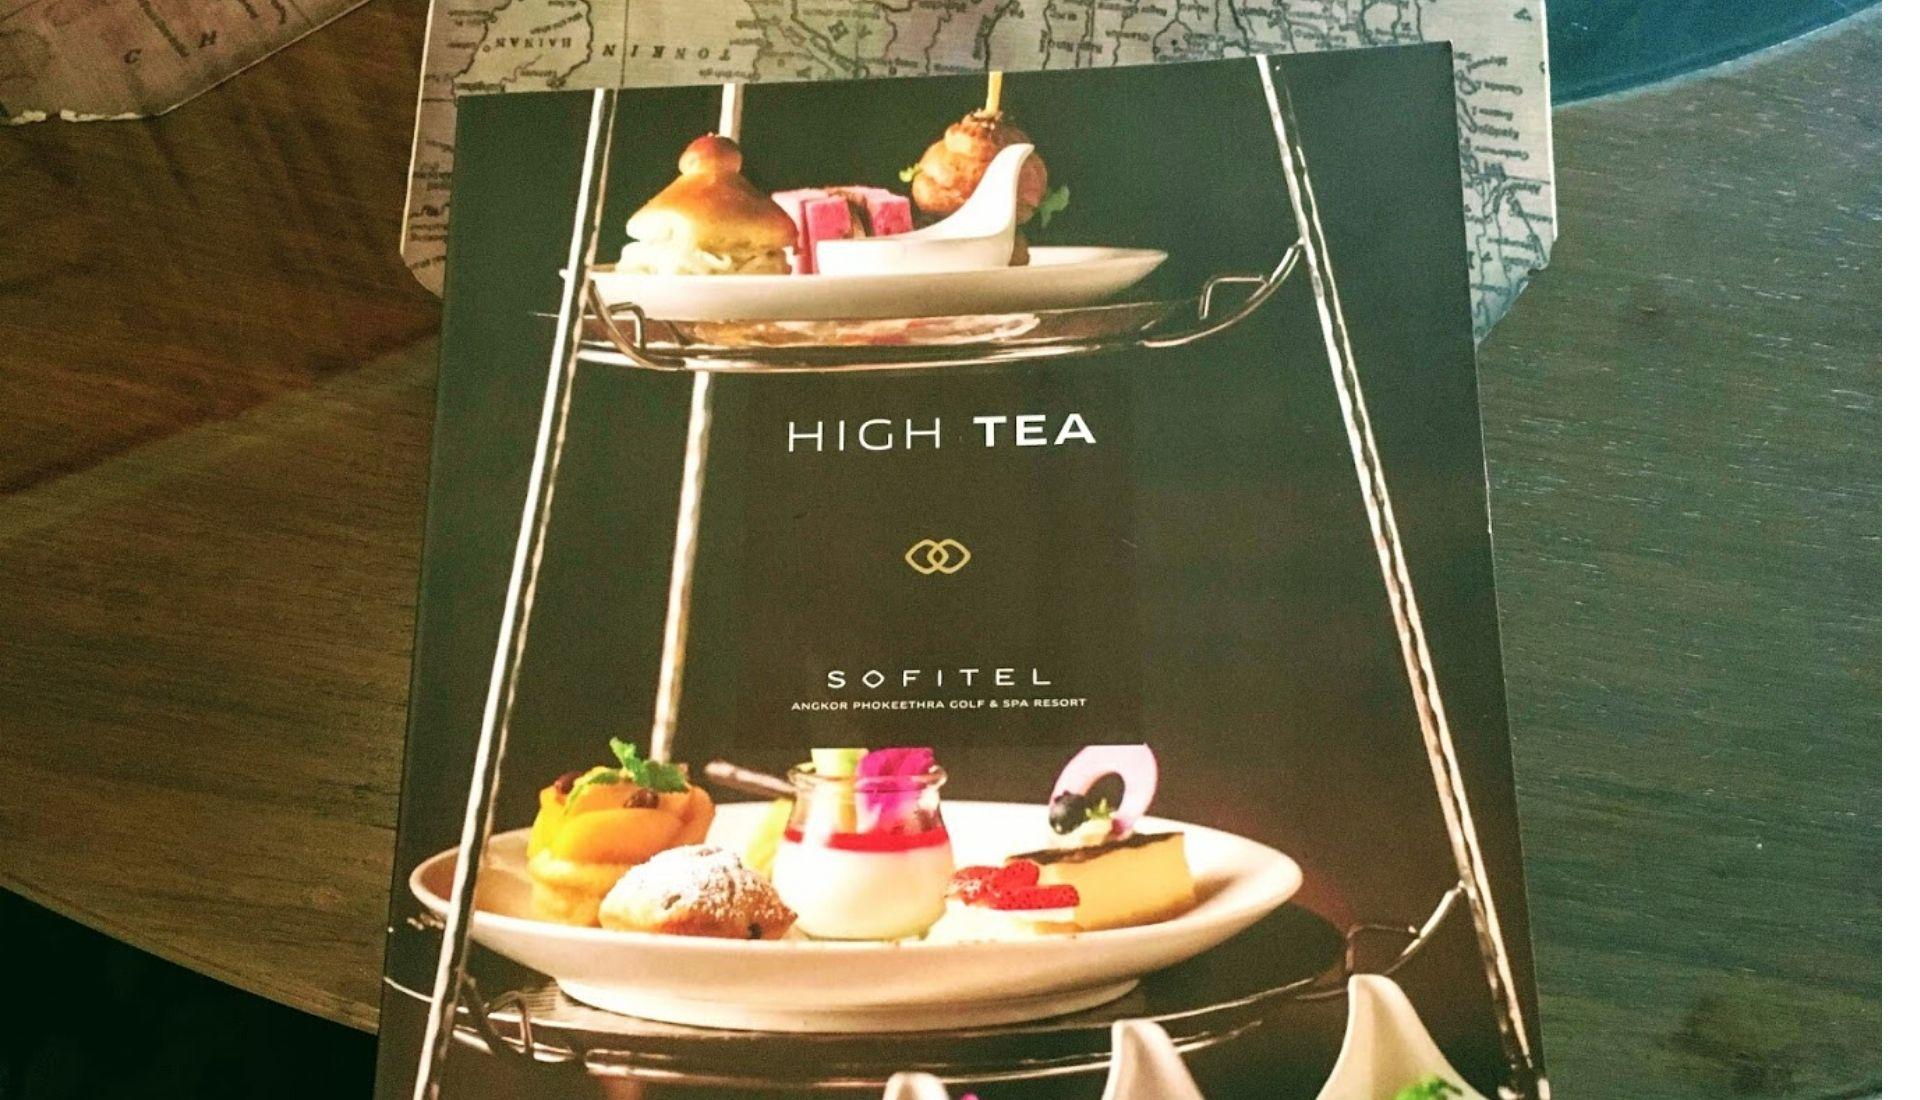 High Tea at the Sofitel